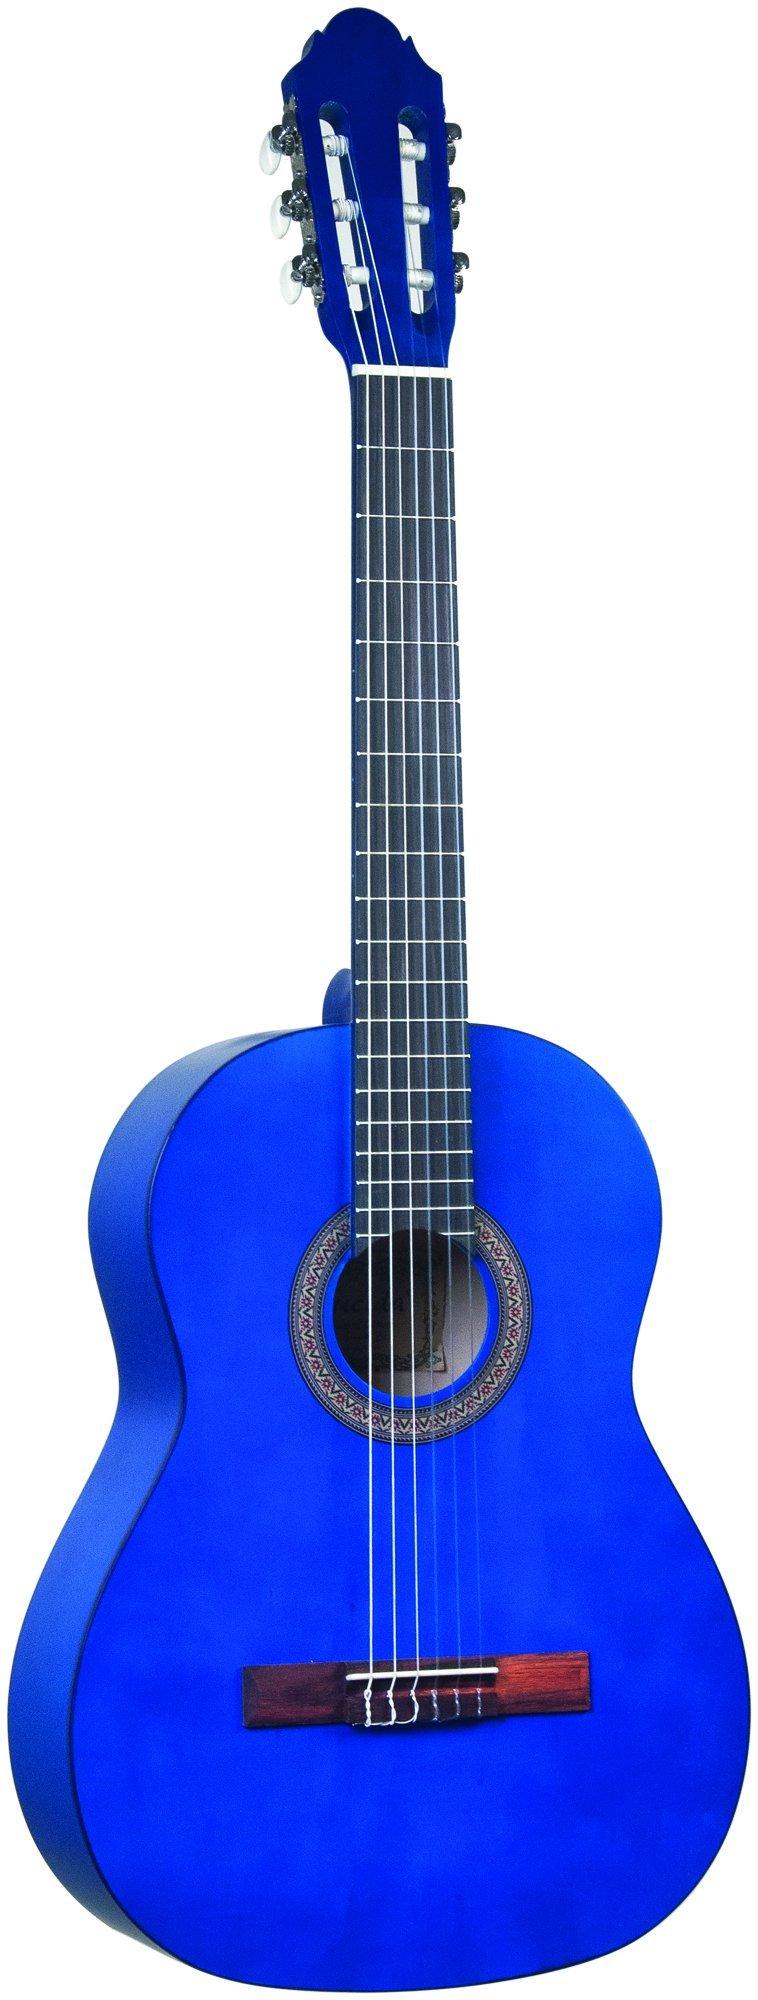 Lucida LG-400-1/2BL Student Classical Guitar, Blue, 1/2 Size